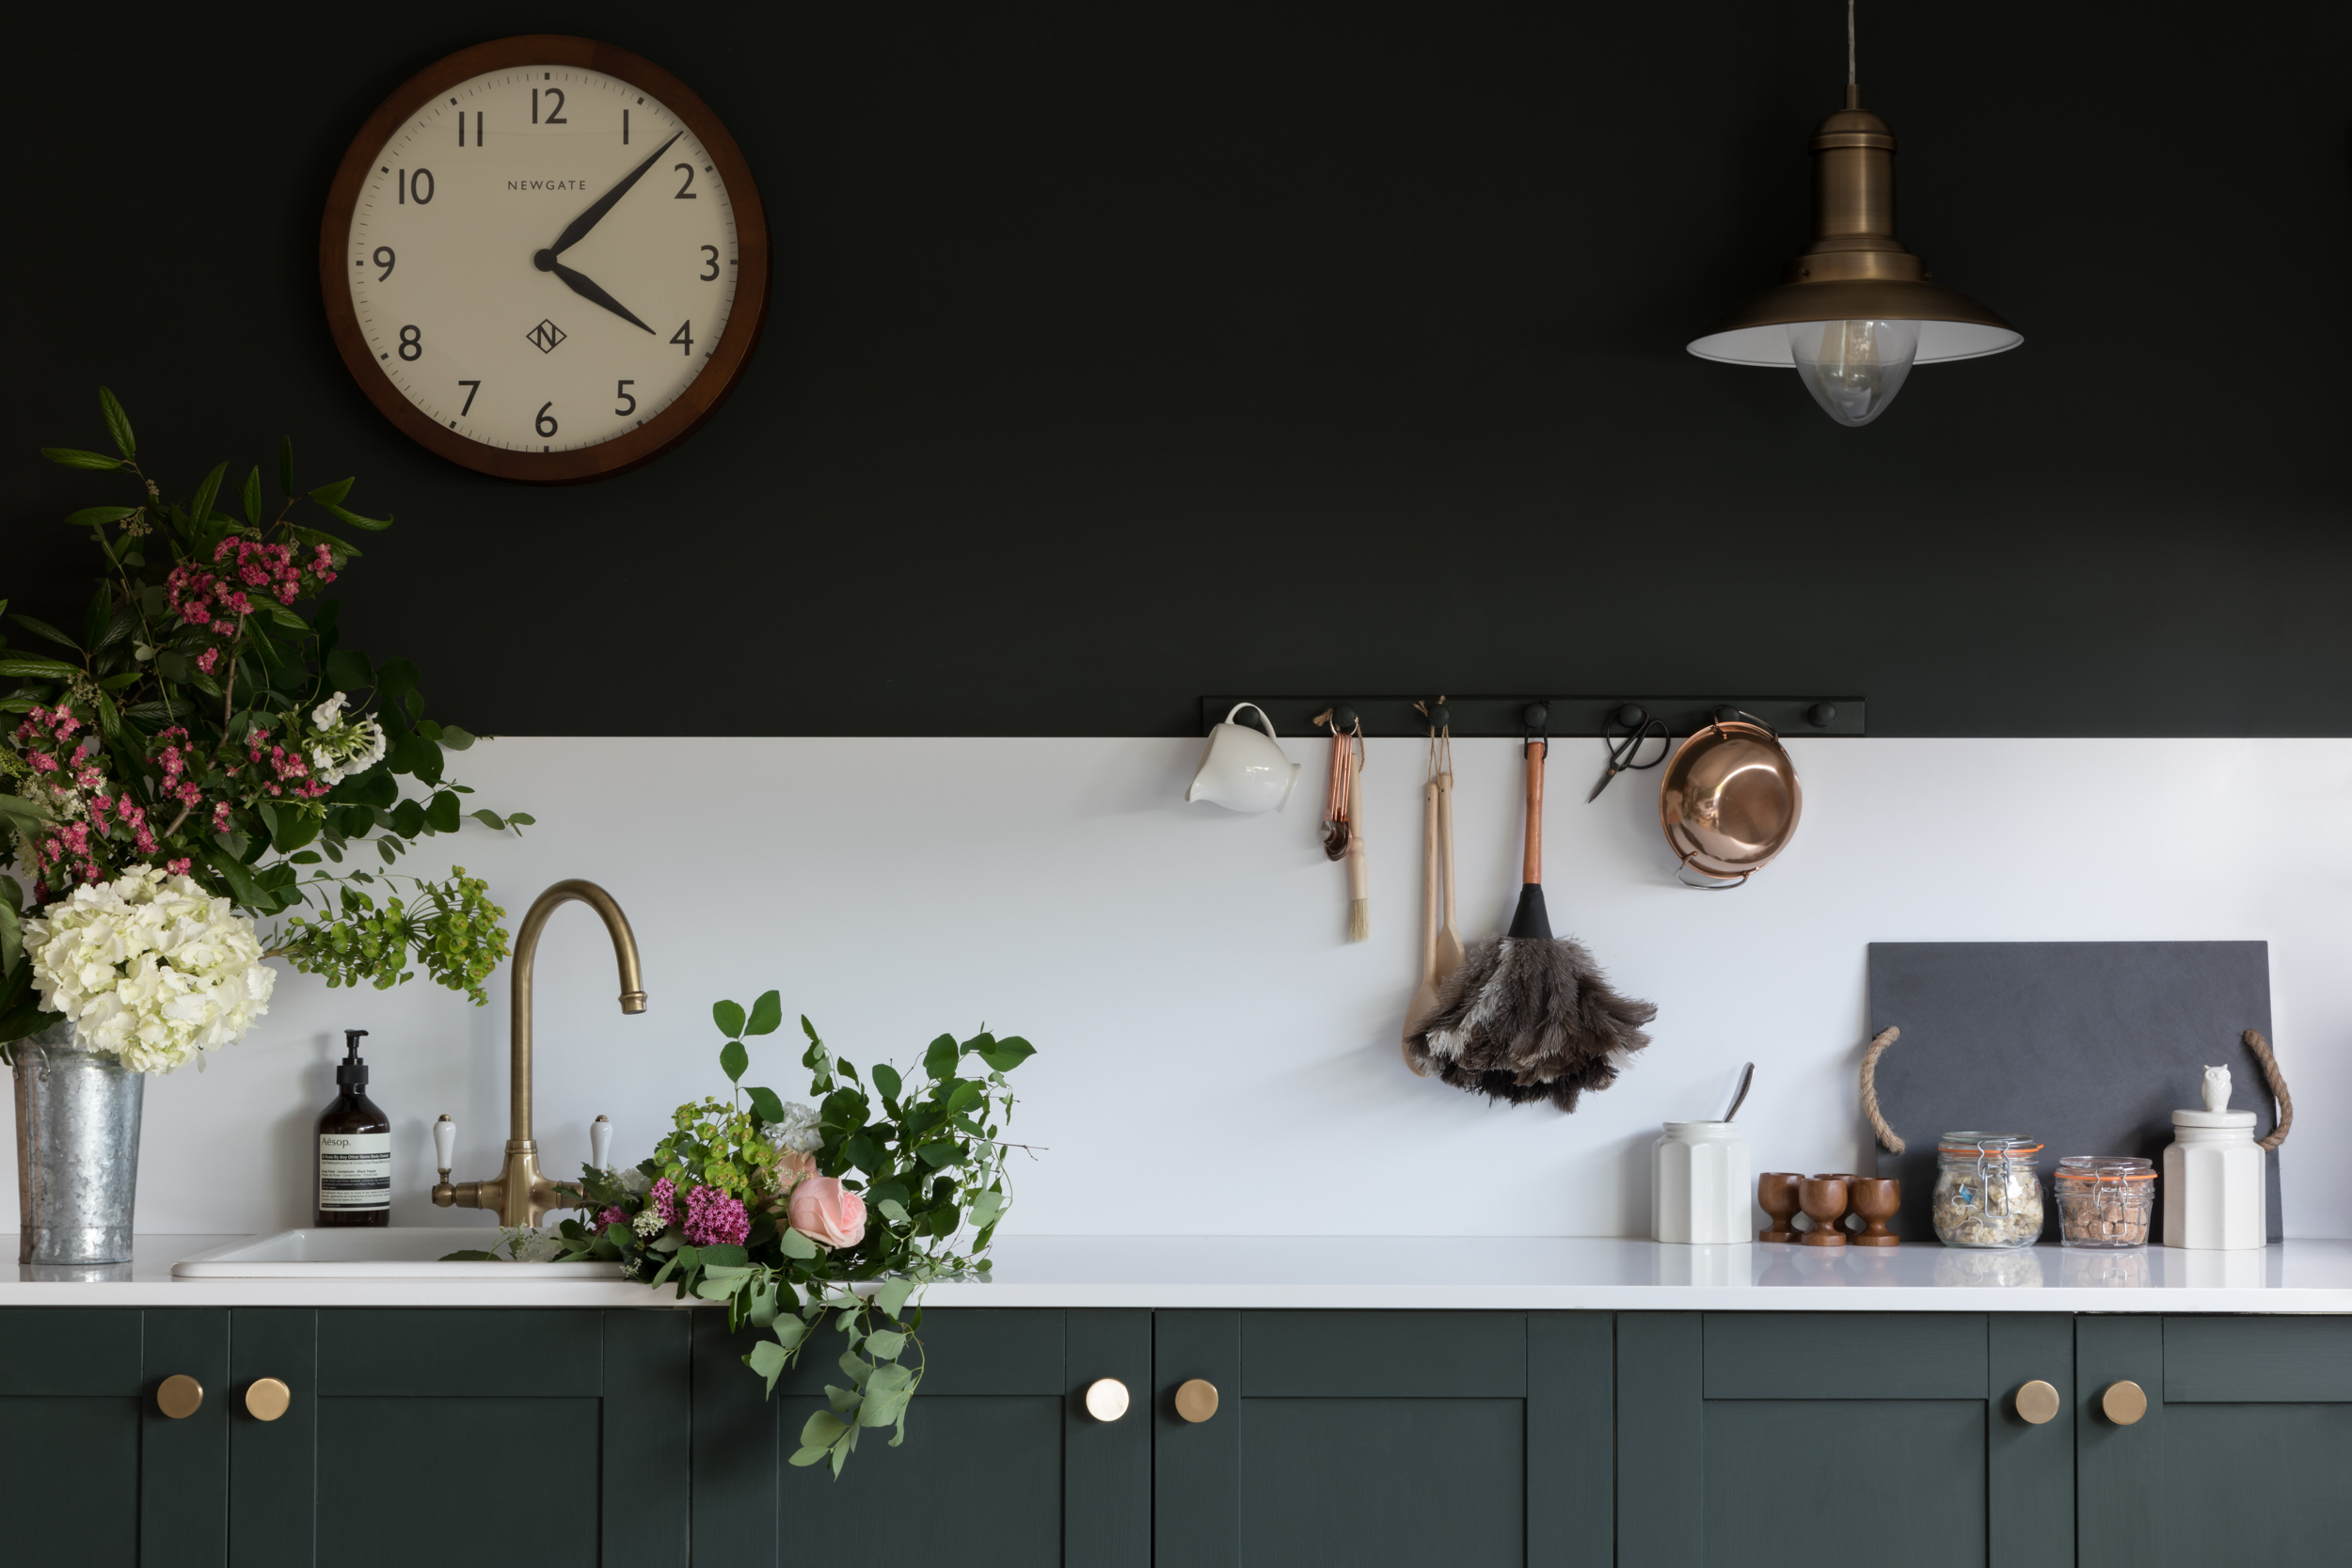 paul craig photography photographer interiors kitchen